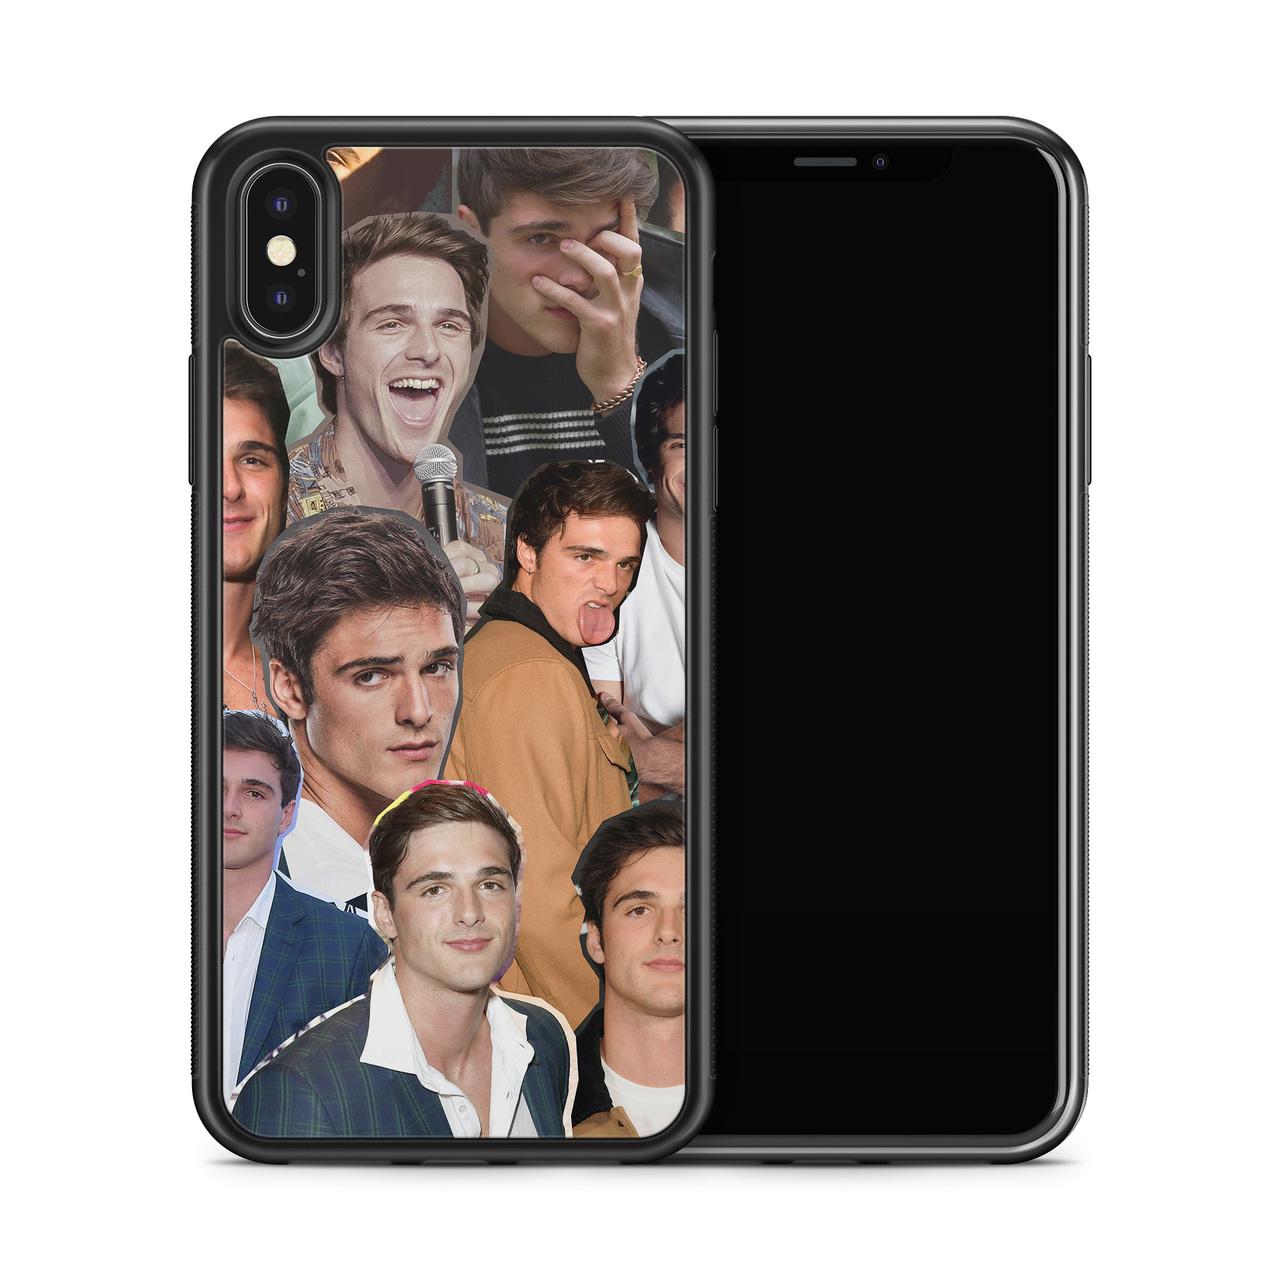 Jacob Elordi Phone Case